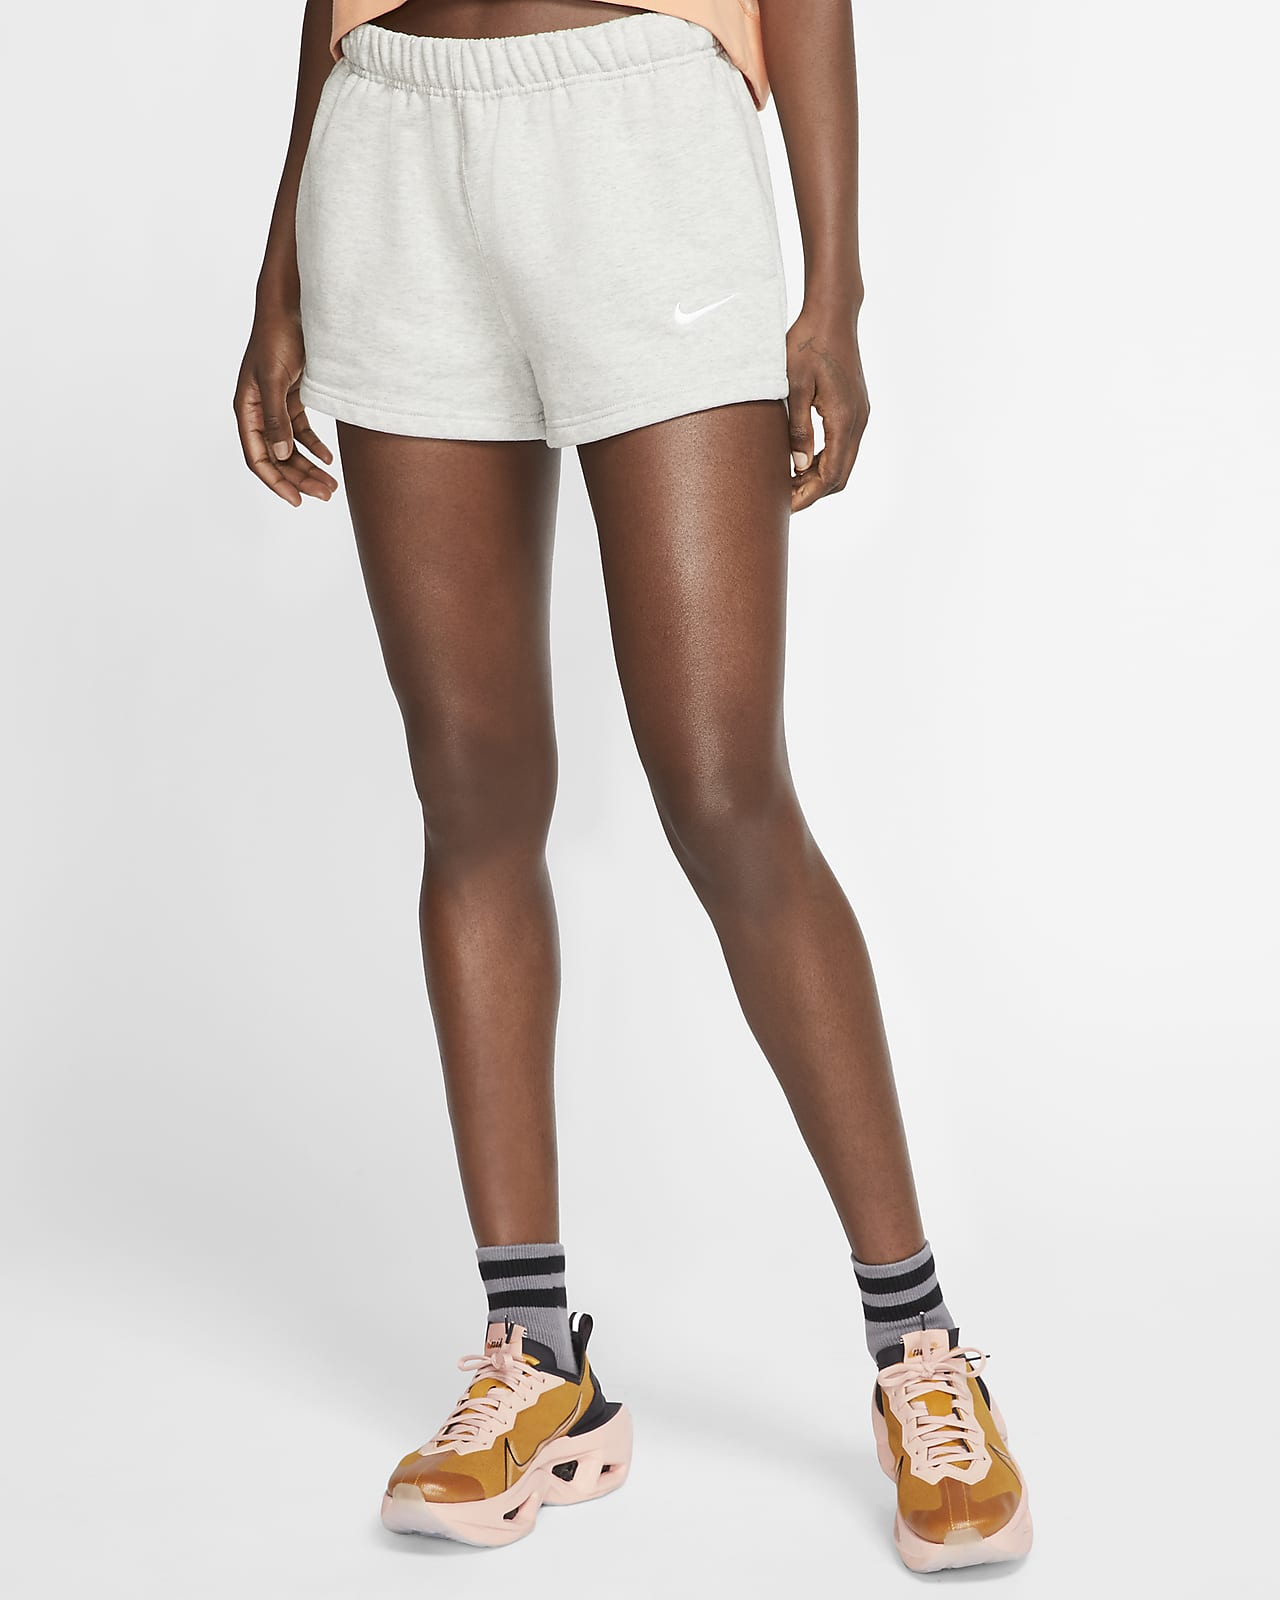 NikeLab Women's Fleece Shorts